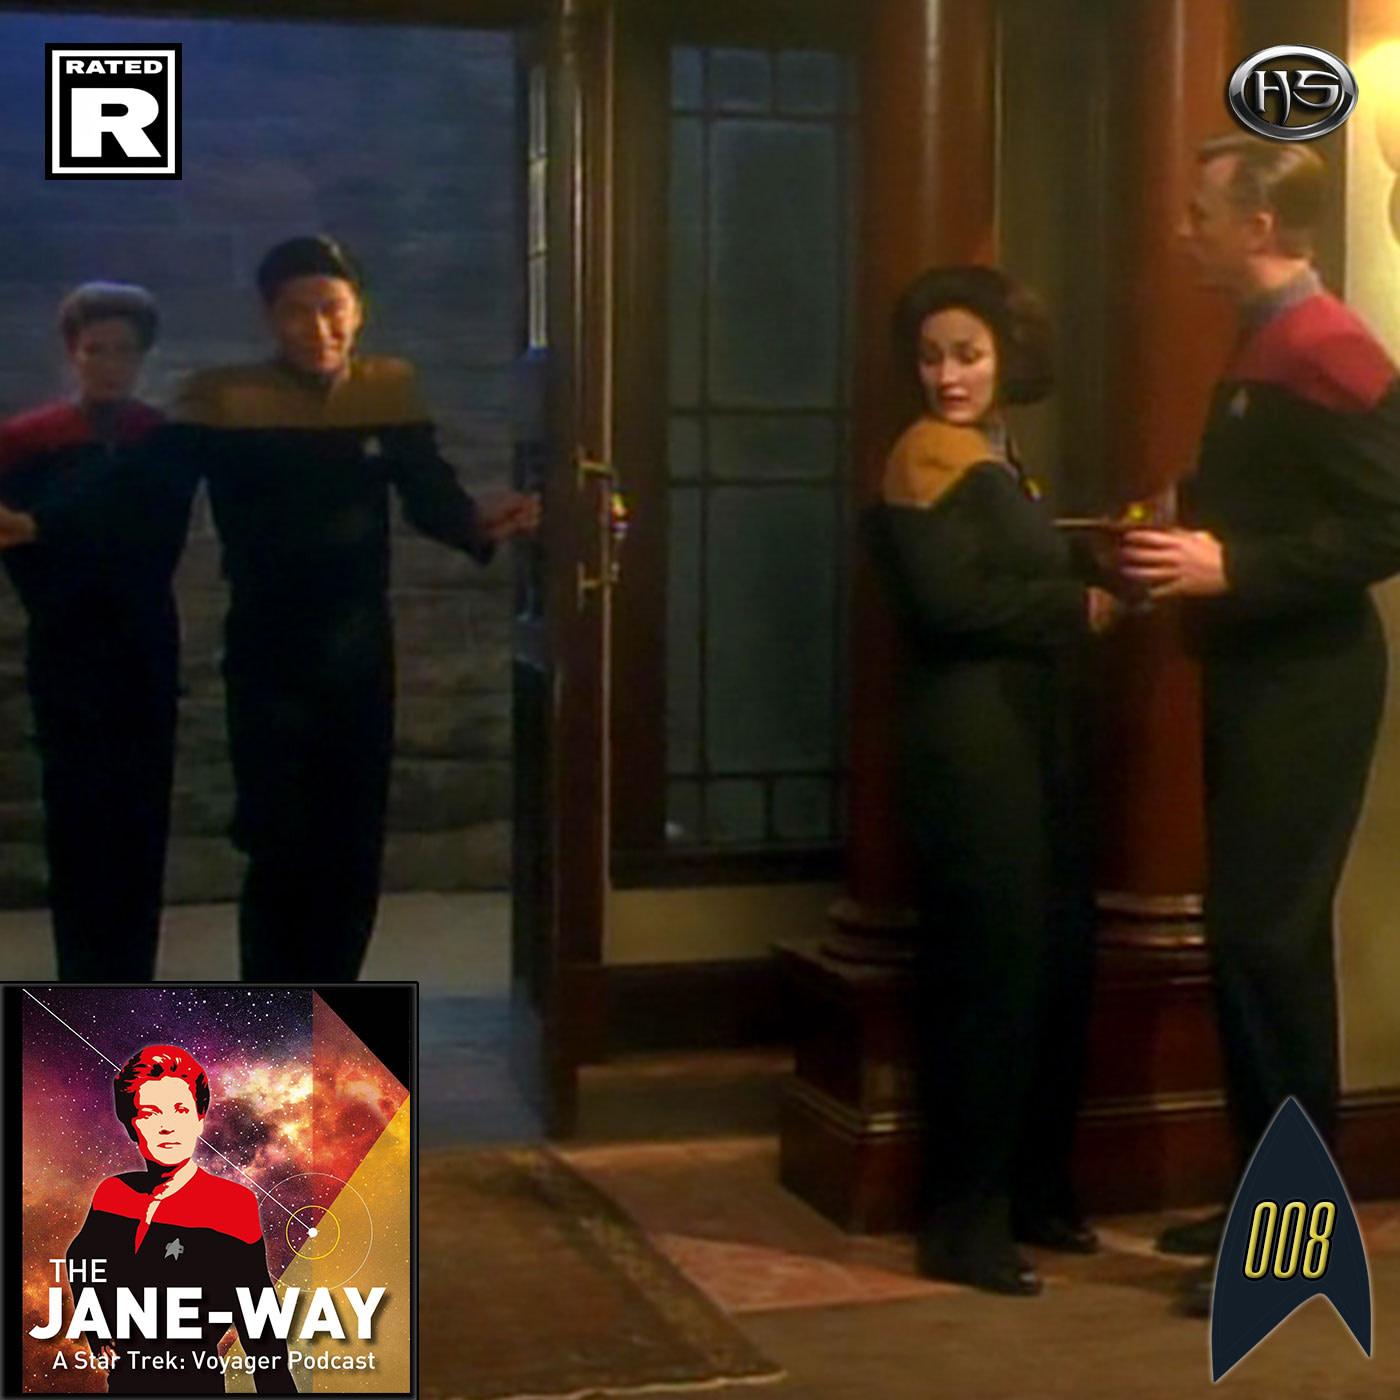 TheJane-Way Episode 8